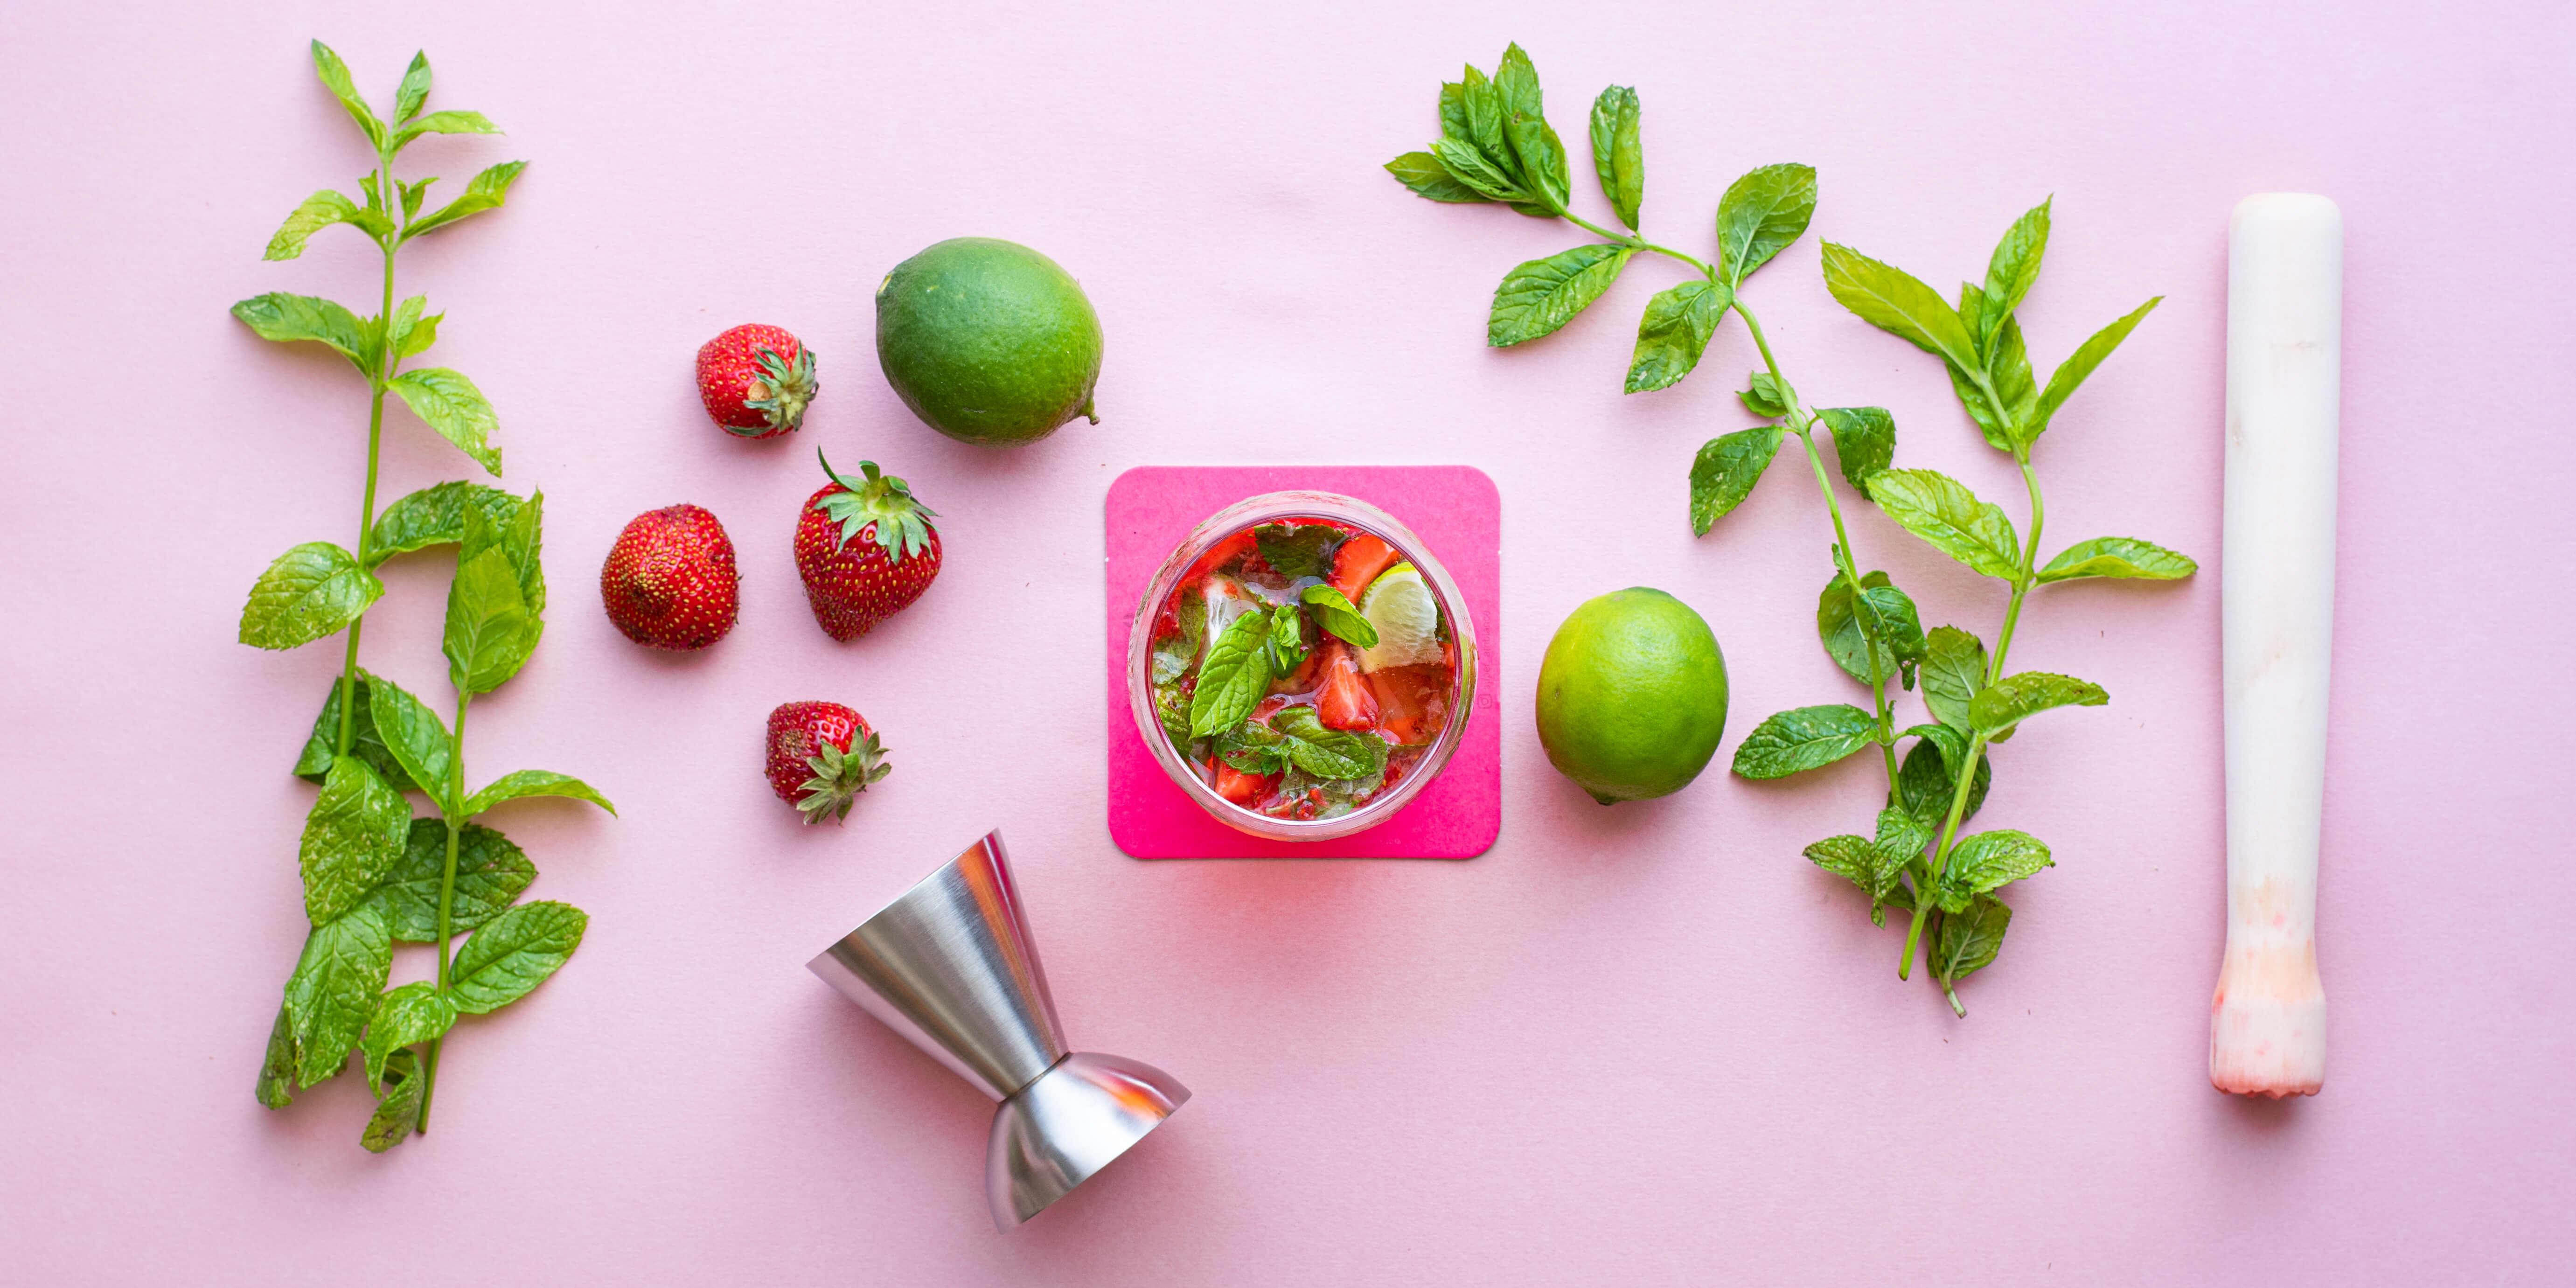 Virgin mojito fraise {vegan, sans gluten, sans alcool}